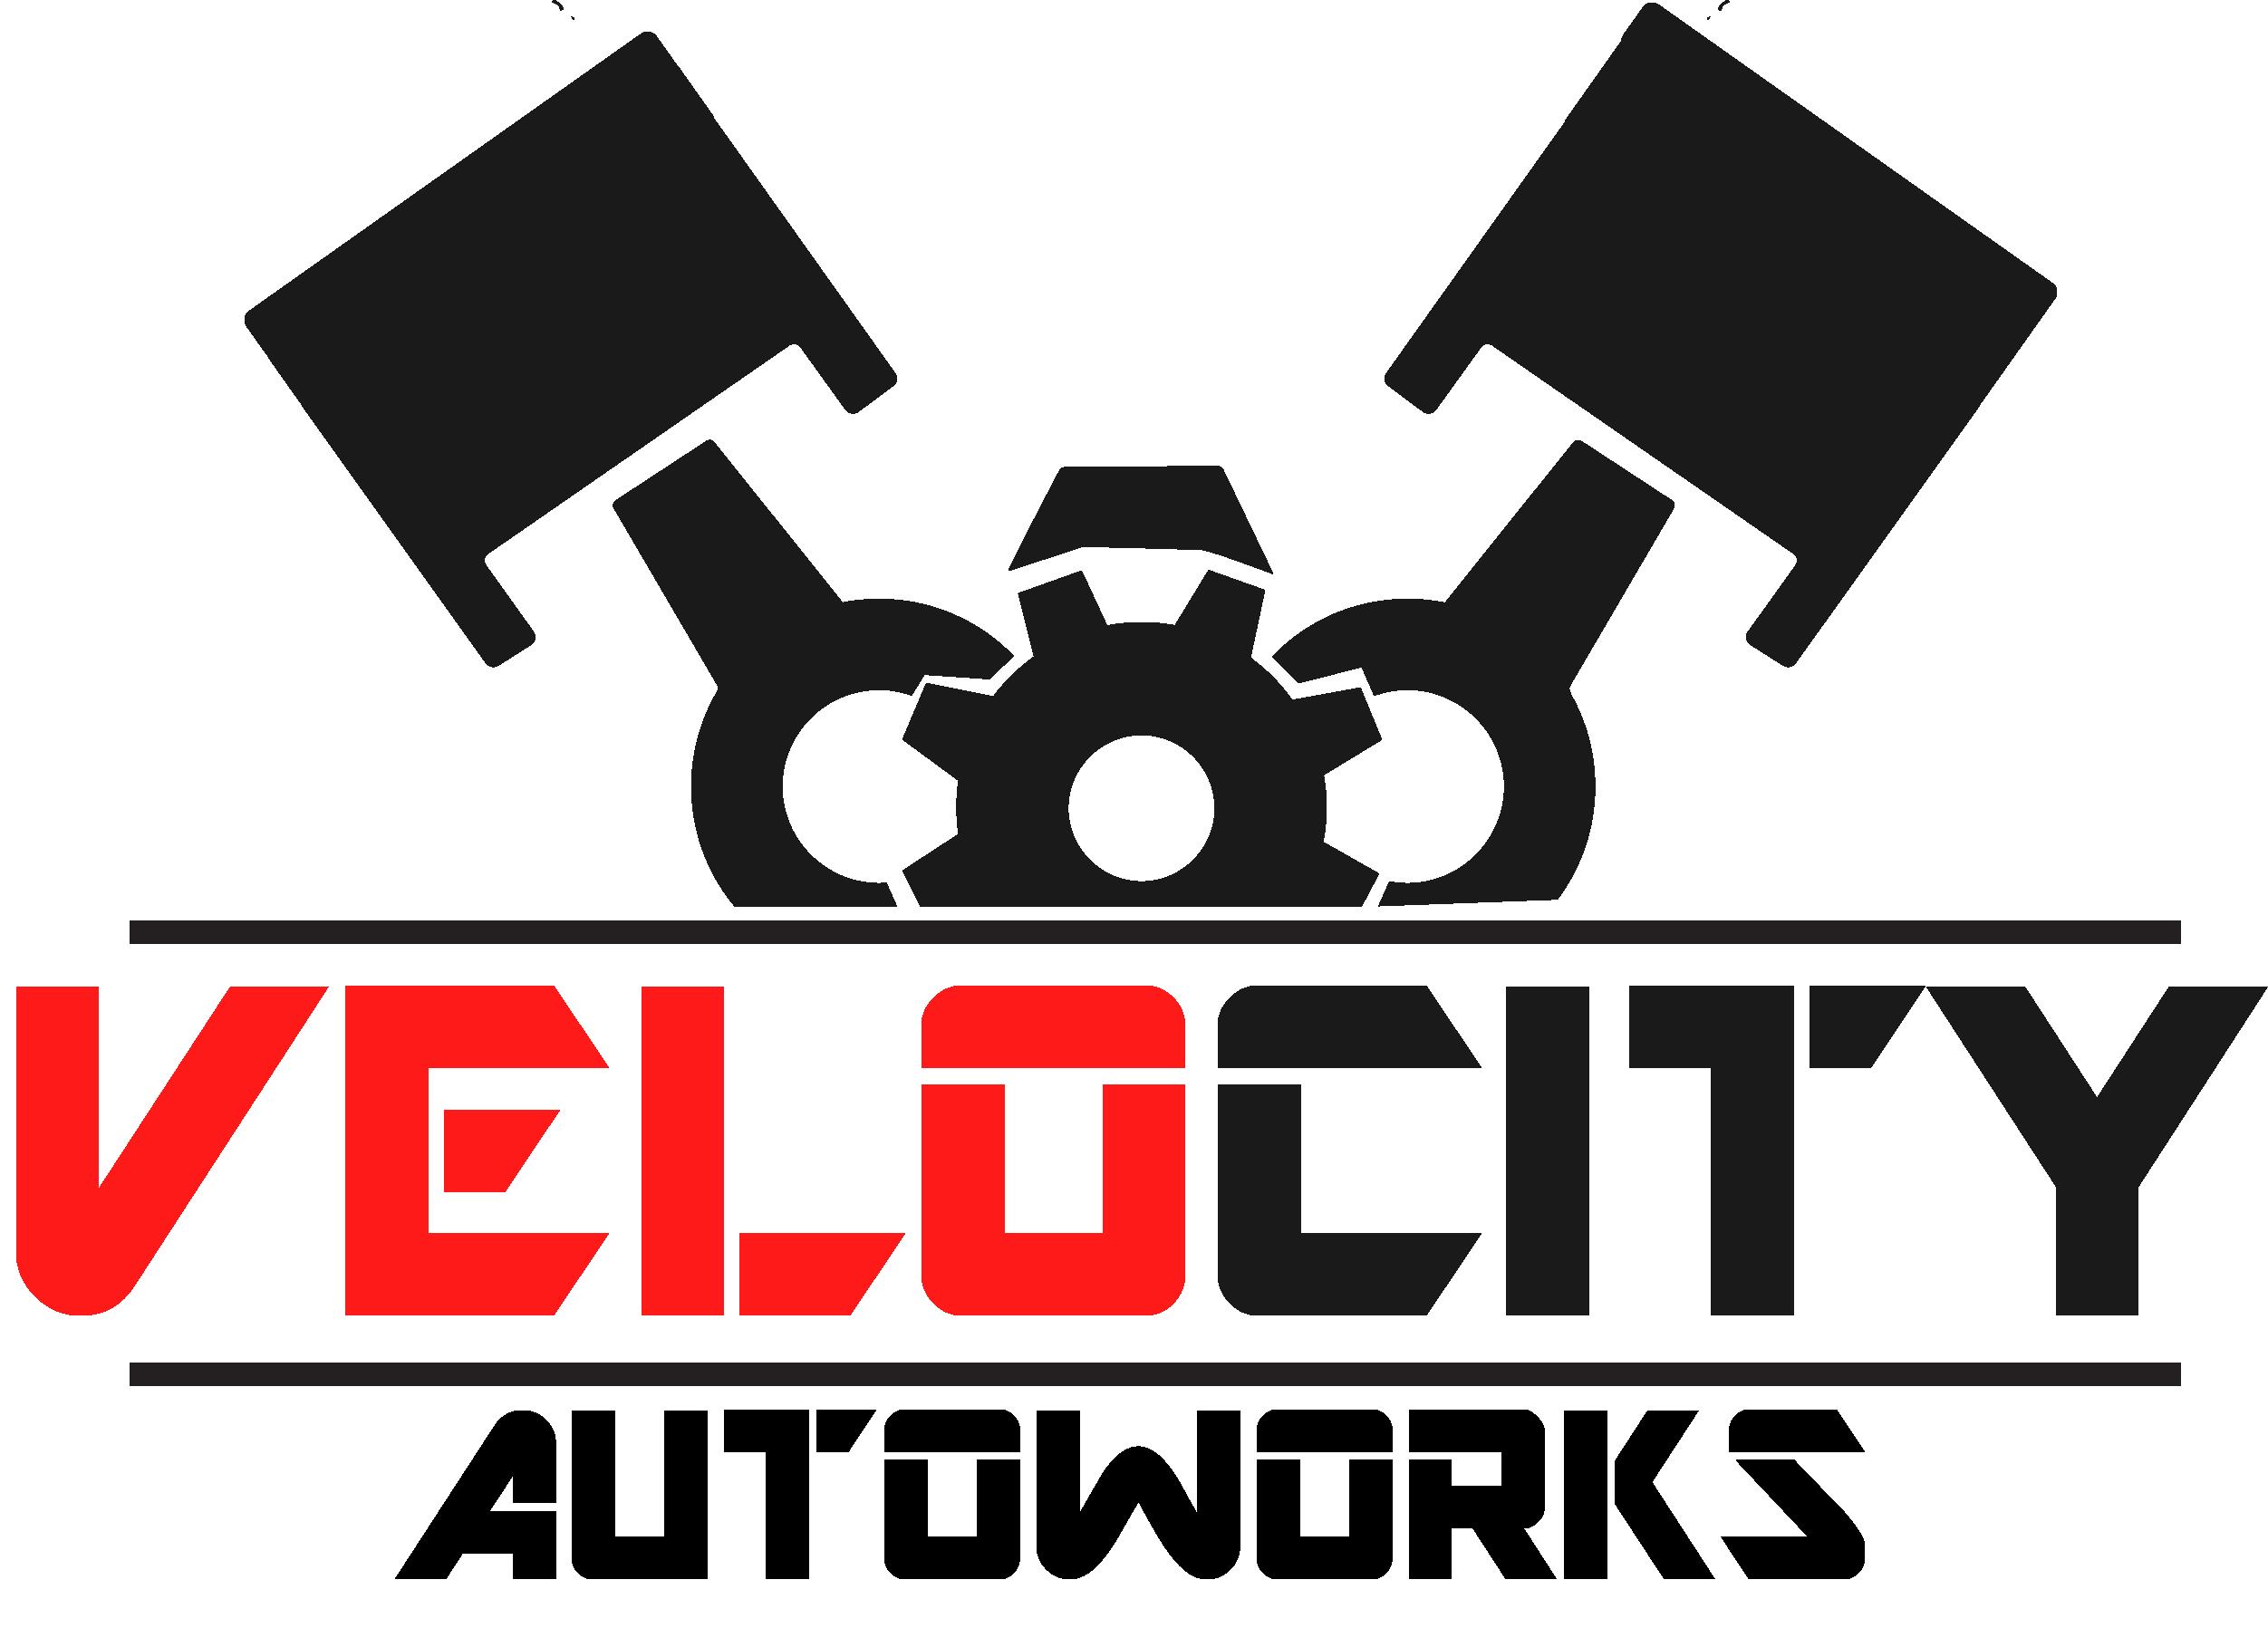 Velocity logo minimized colored